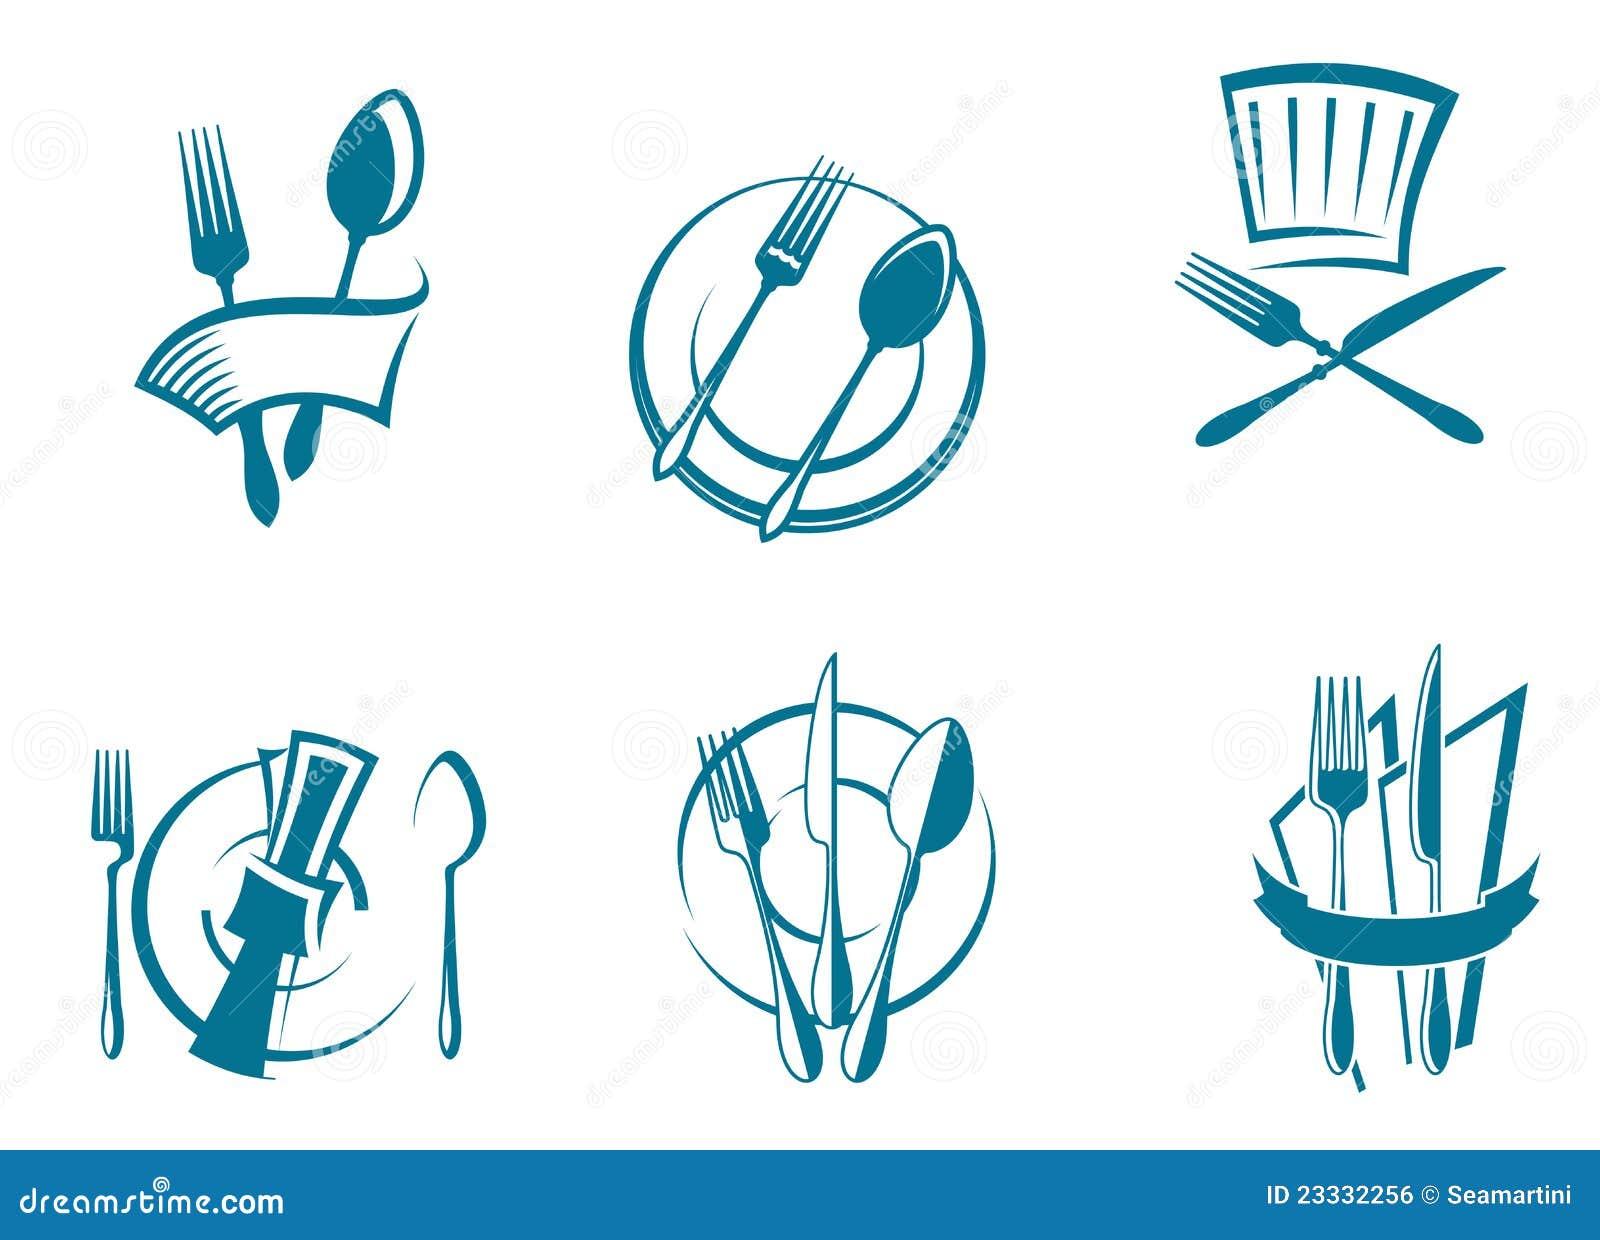 ... Menu Icons And Symbols Royalty Free Stock Image - Image: 23332256